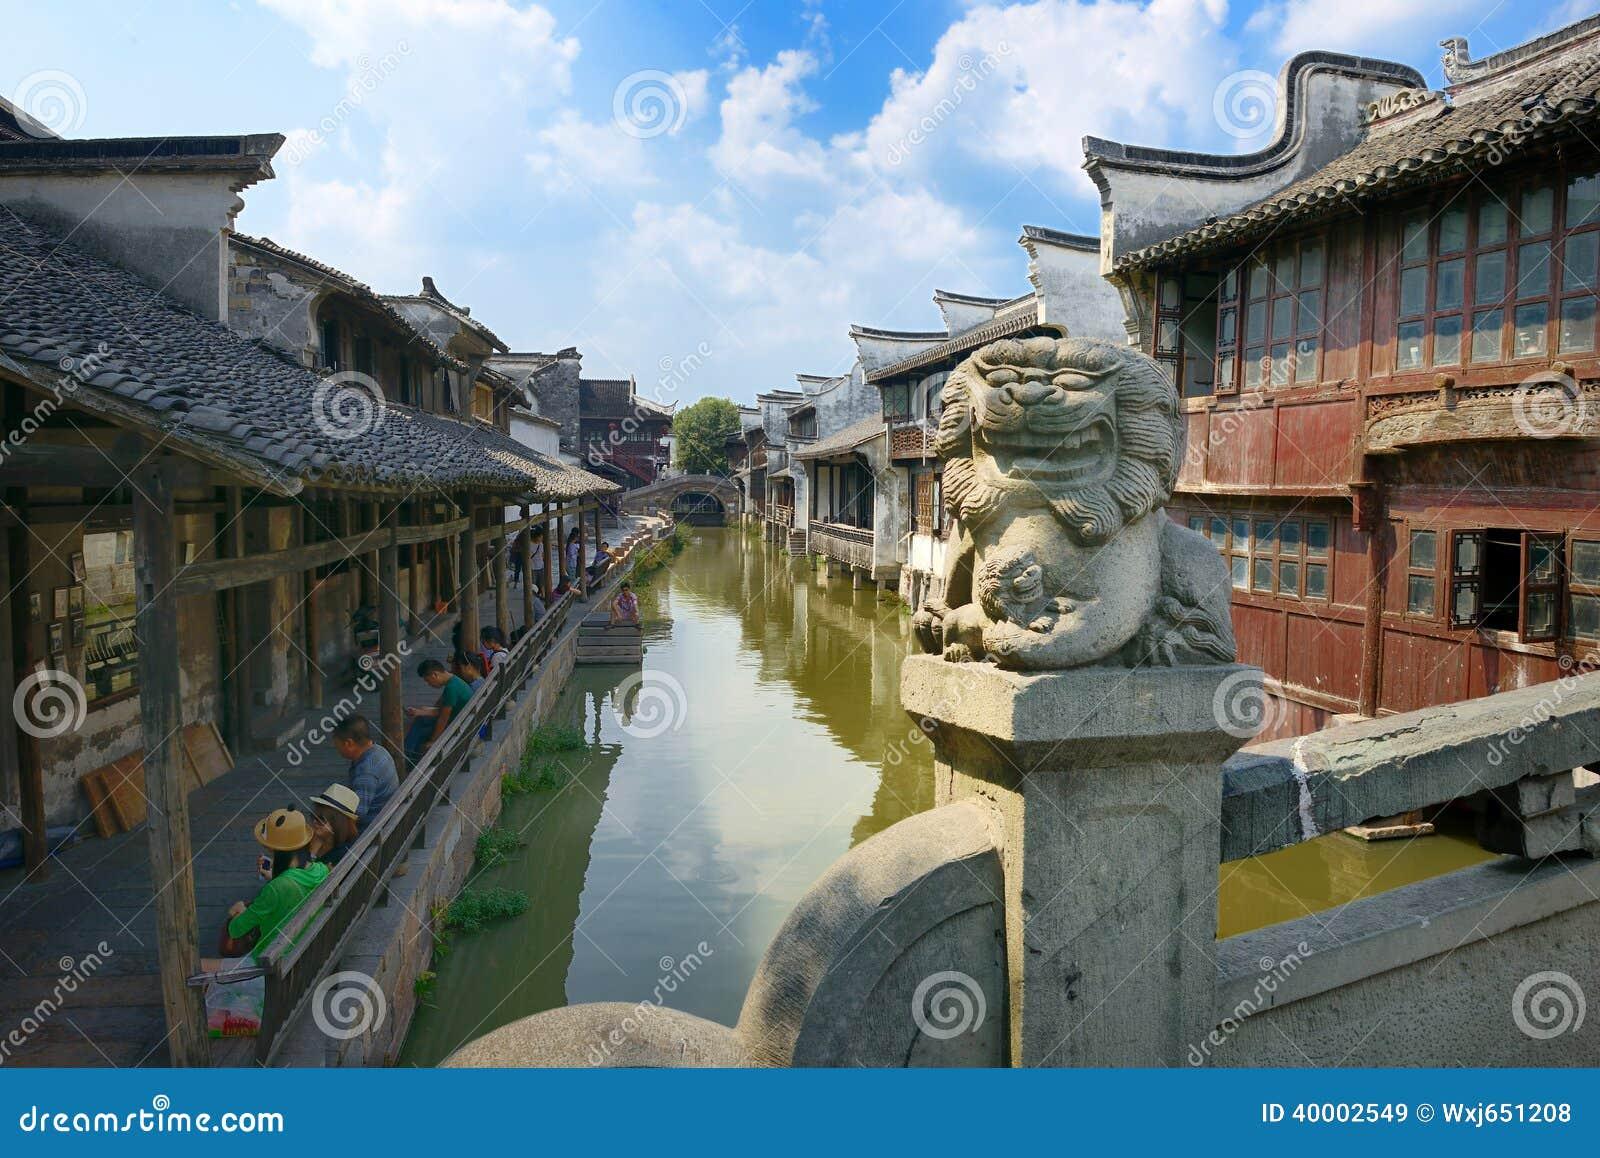 China,Shanghai Water Village Wuzhen 1 Editorial Stock ...